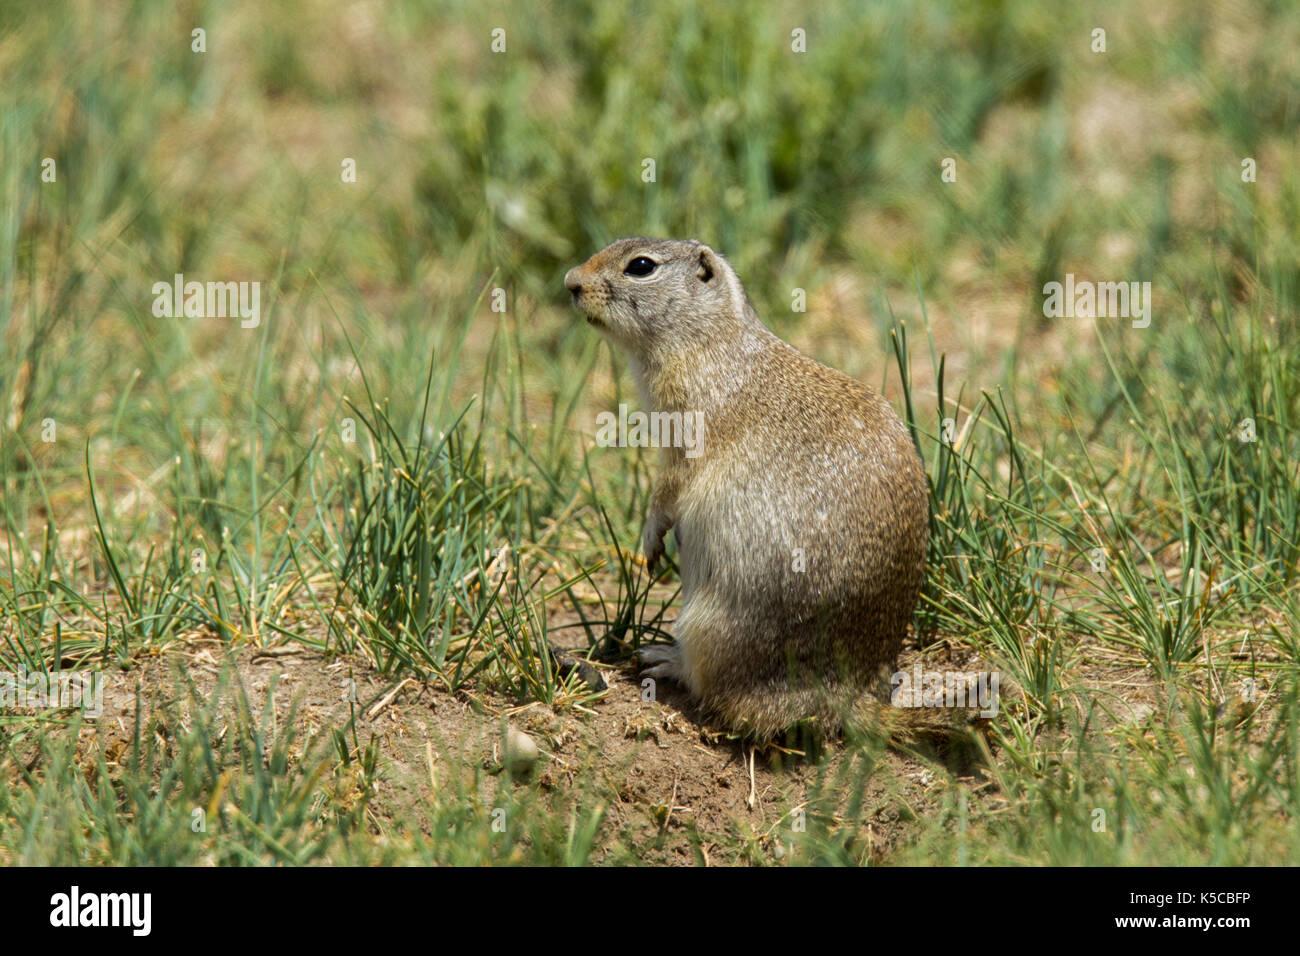 Wyoming Ground Squirrel  Urocitellus elegans   Arapaho National Wildlife Refuge, Colorado, United States 8 July 2017    Adult      Sciuridae      Form - Stock Image